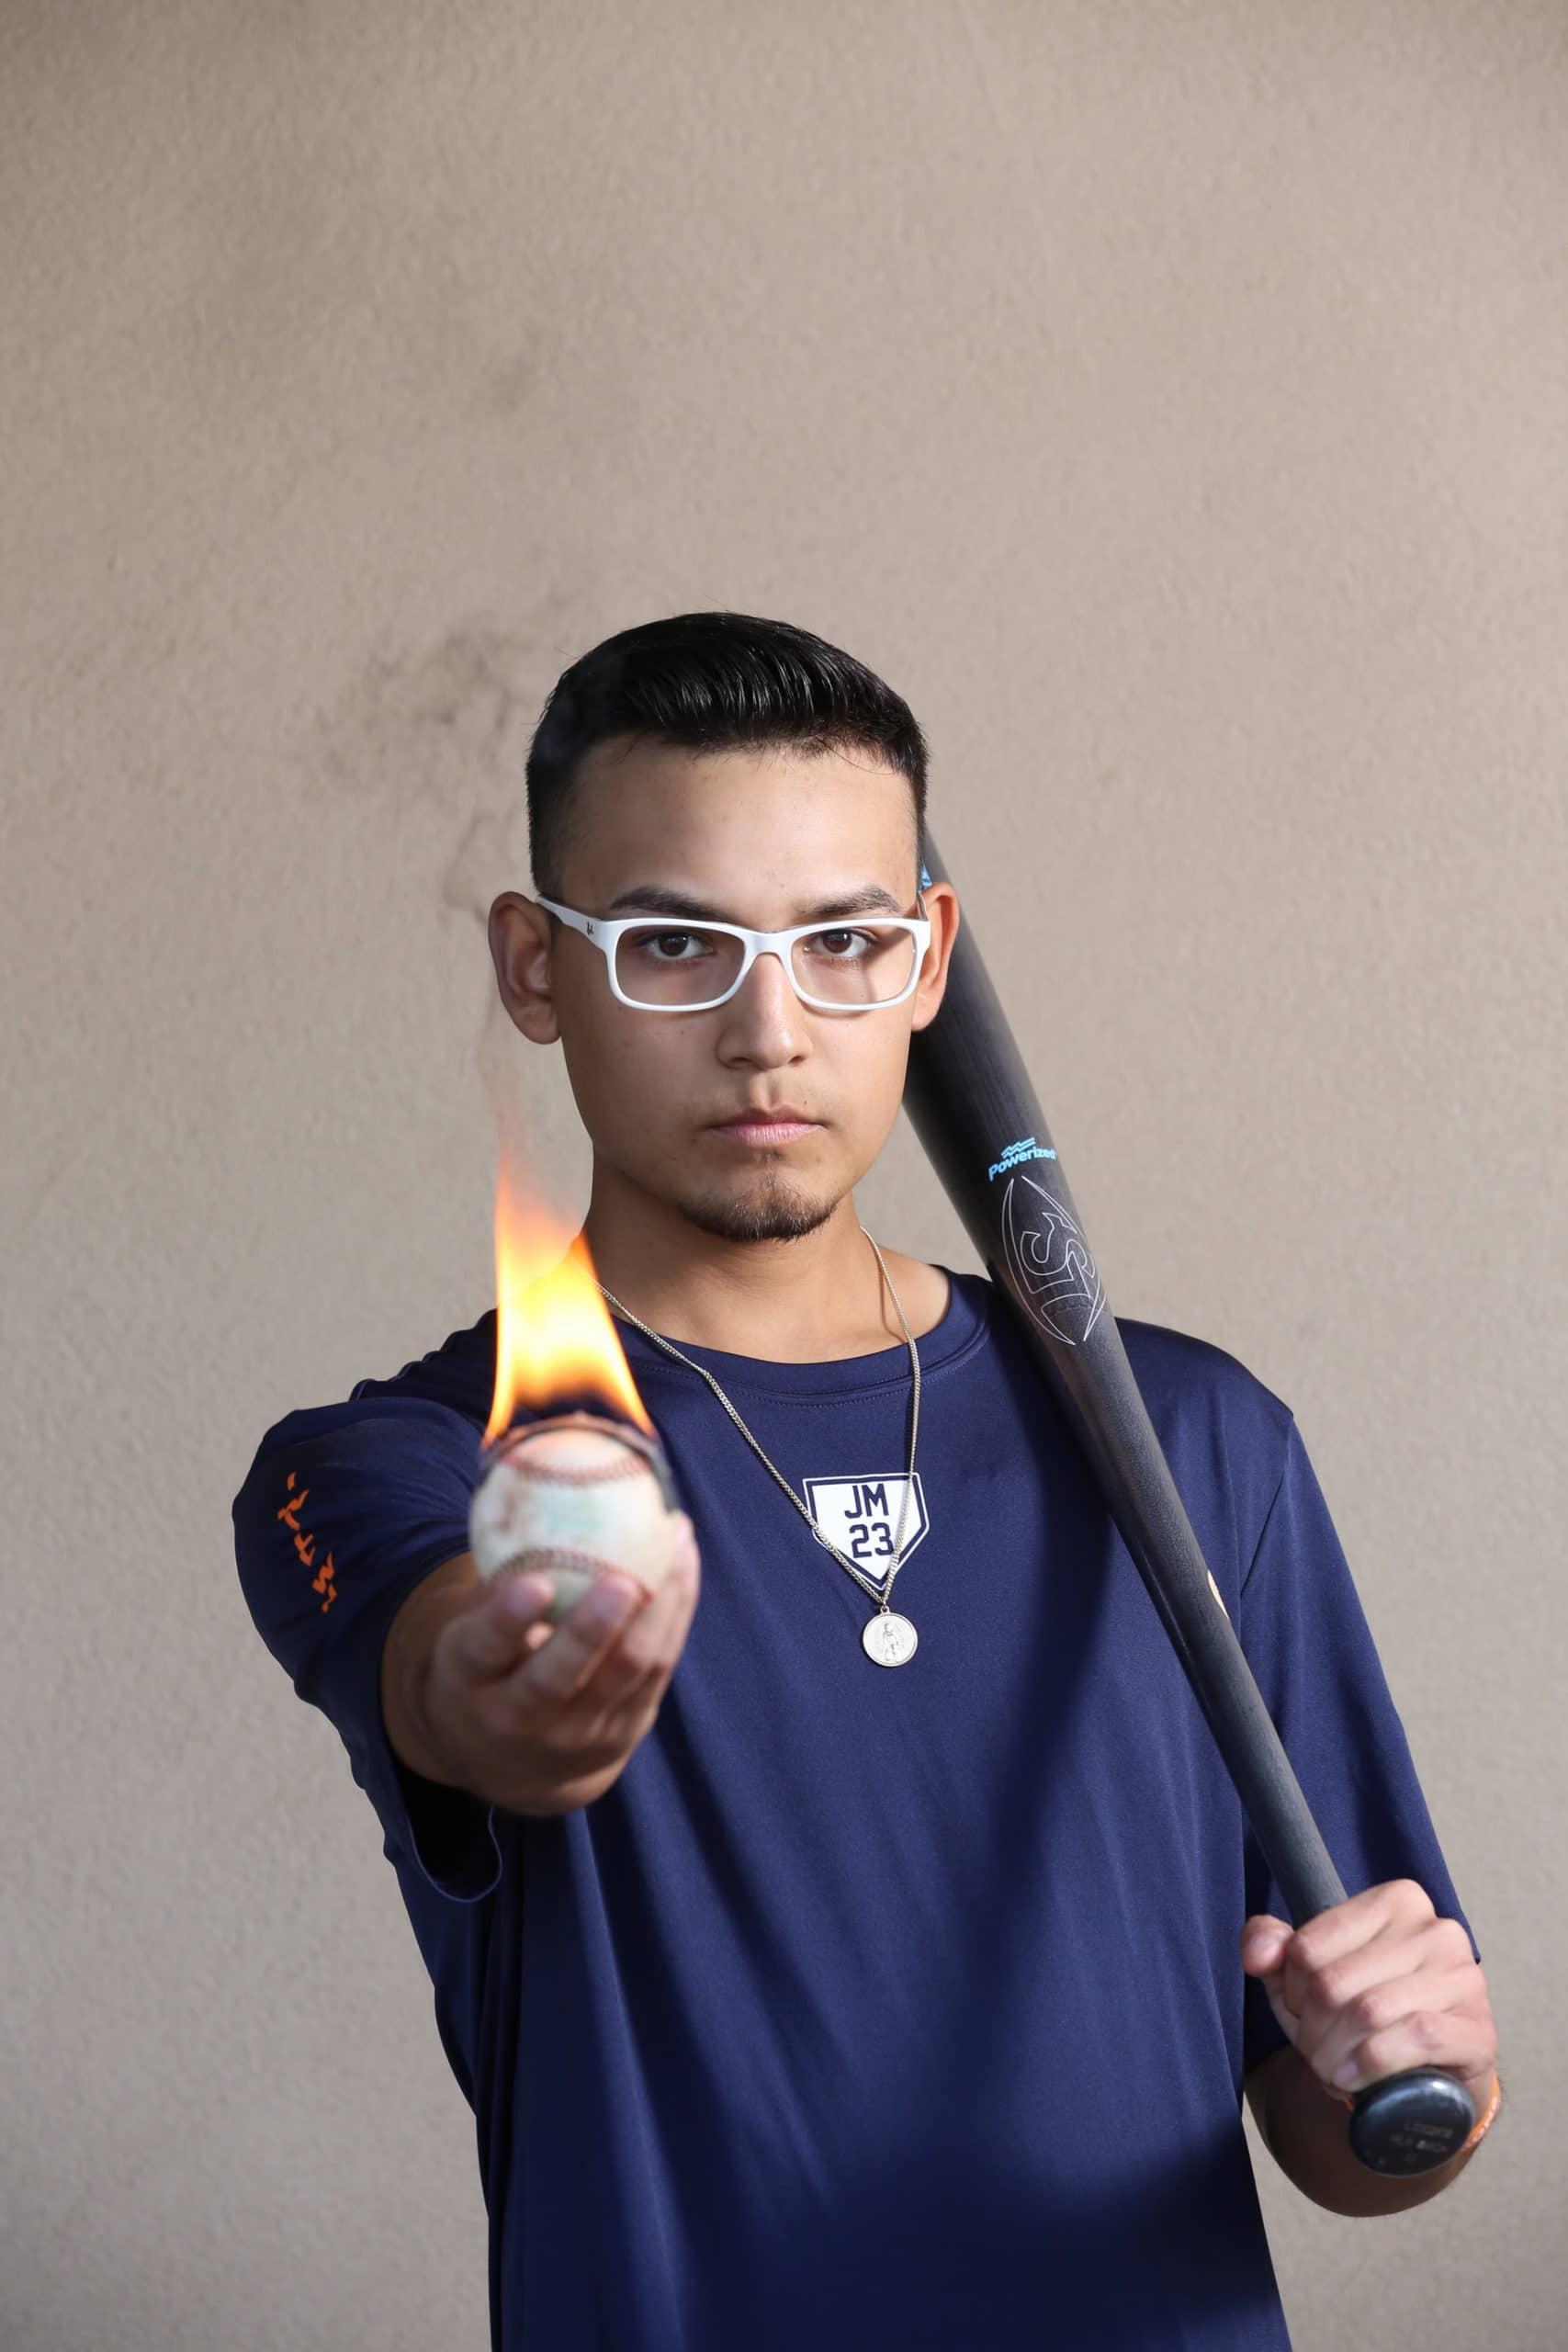 Jacob Michael Medina